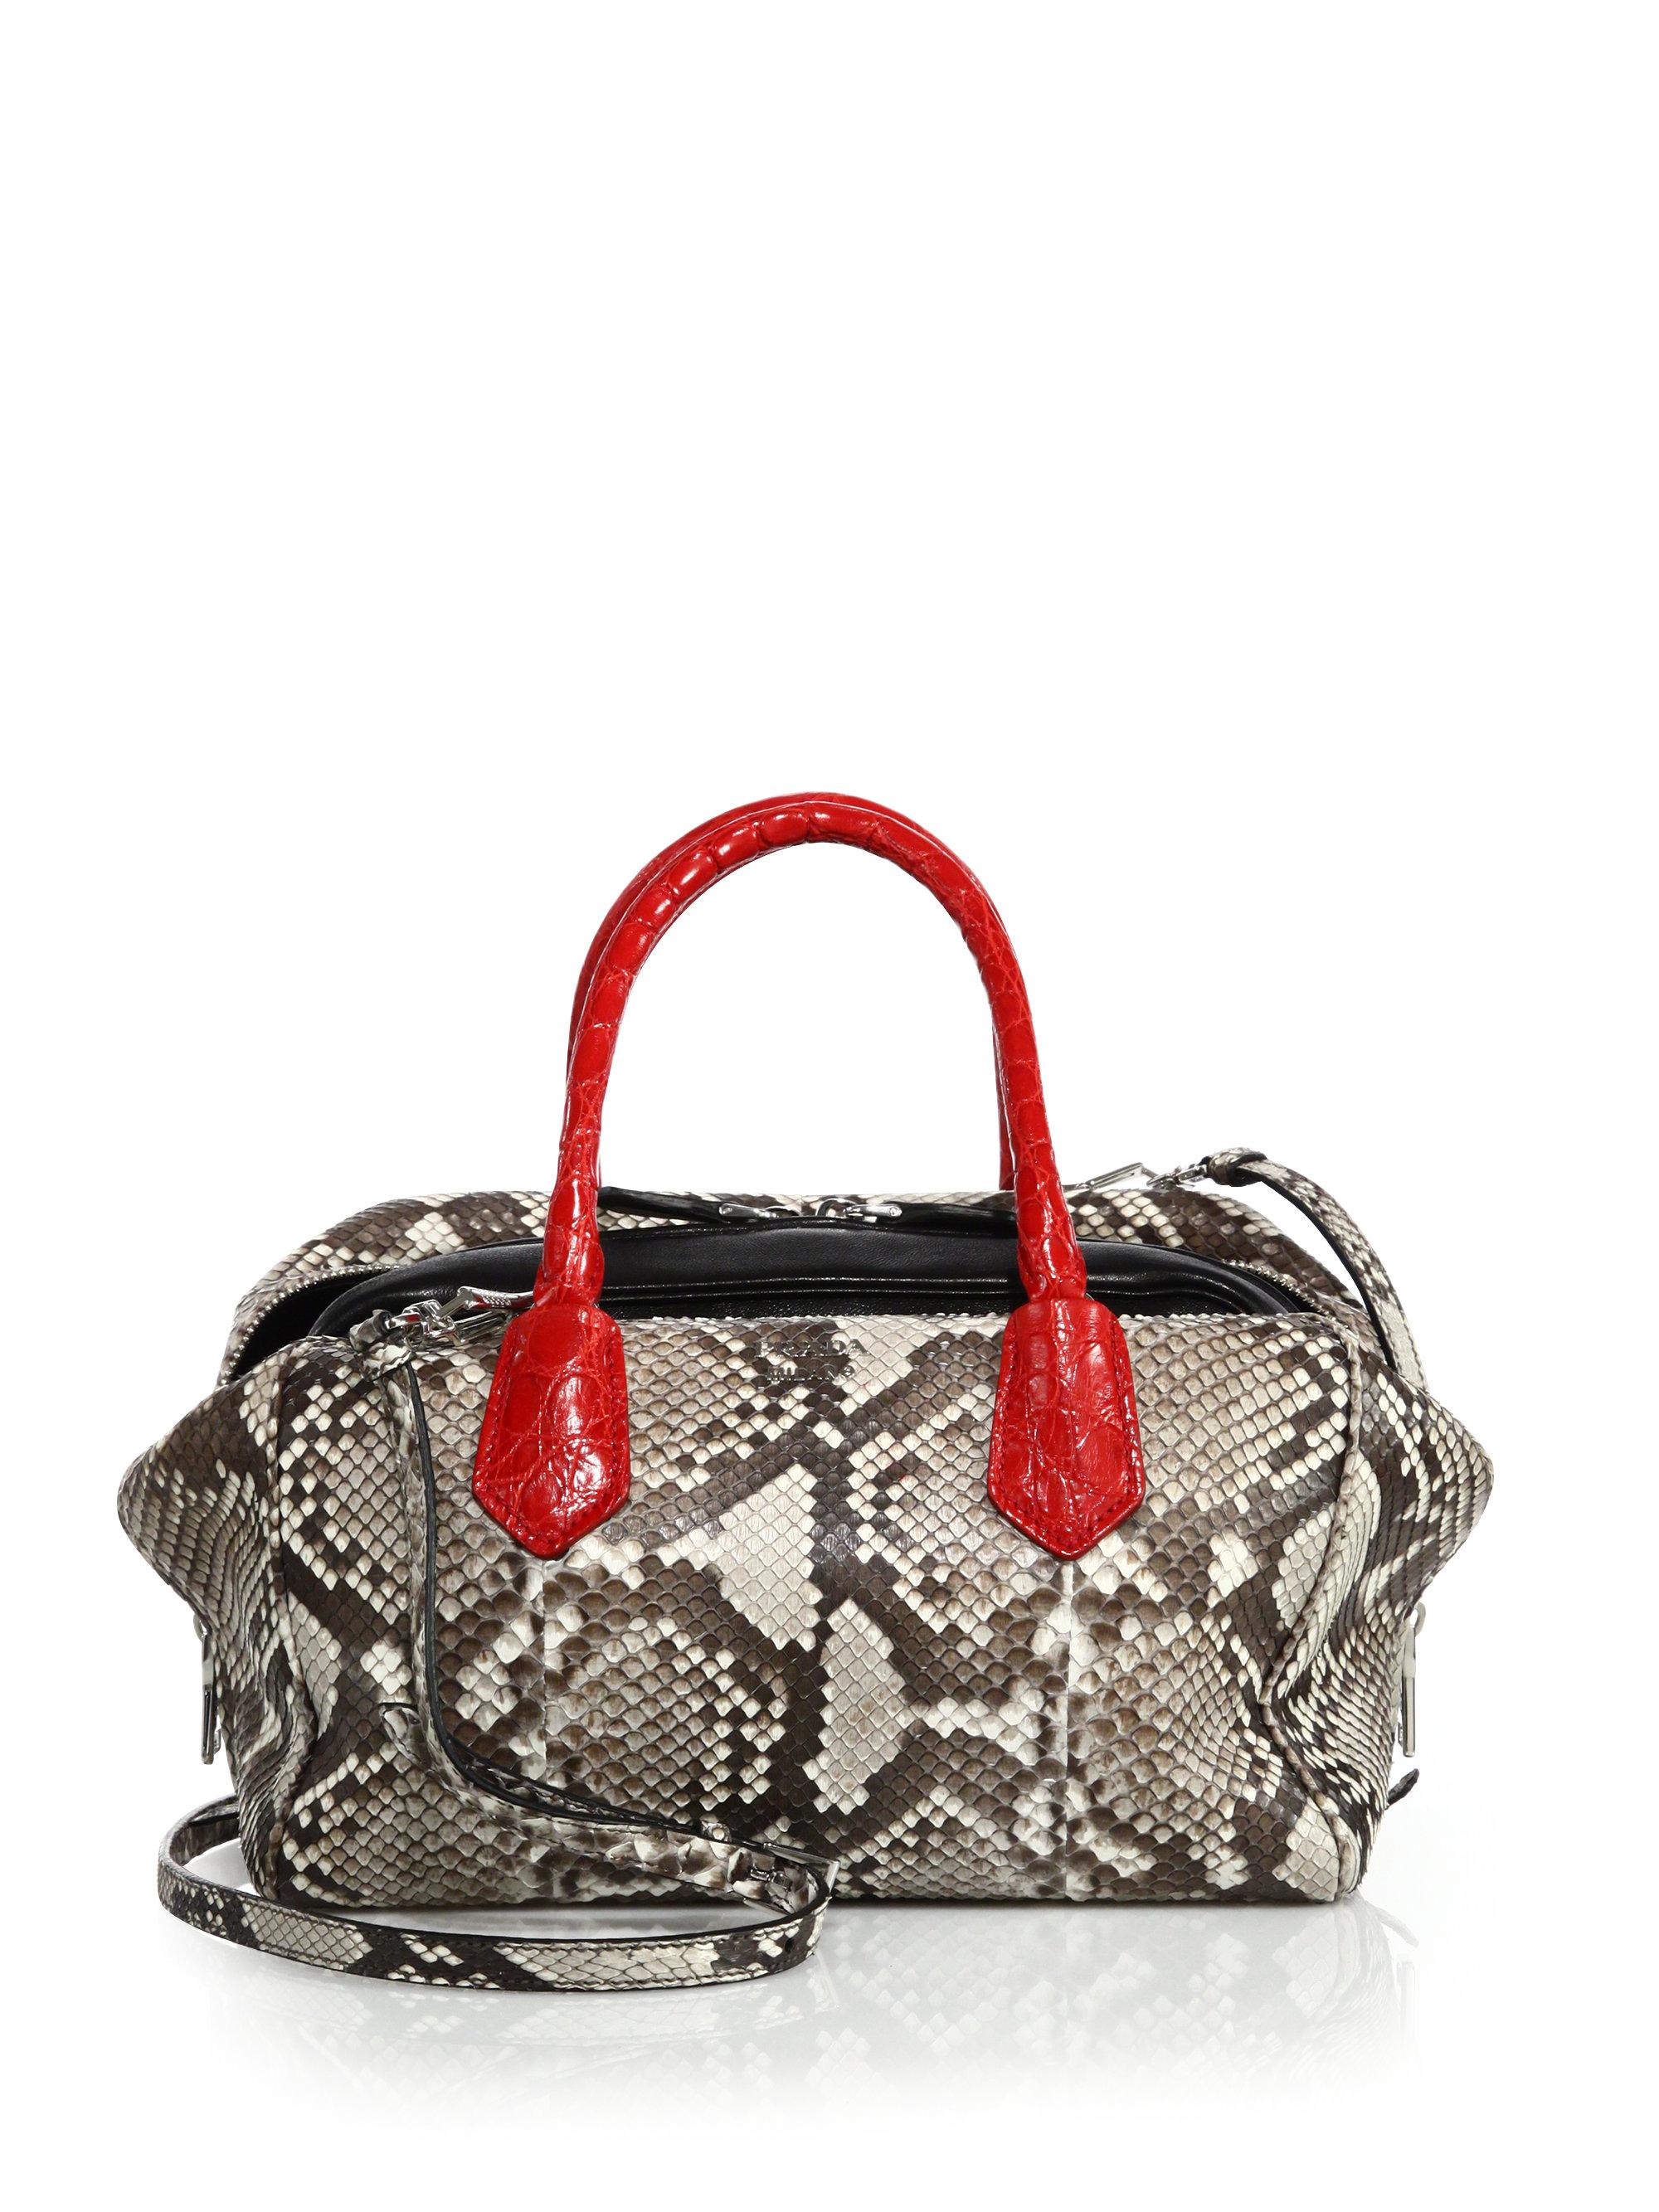 a0b41a0d094881 ... sweden lyst prada python crocodile inside bag in red d6a7c b0e09